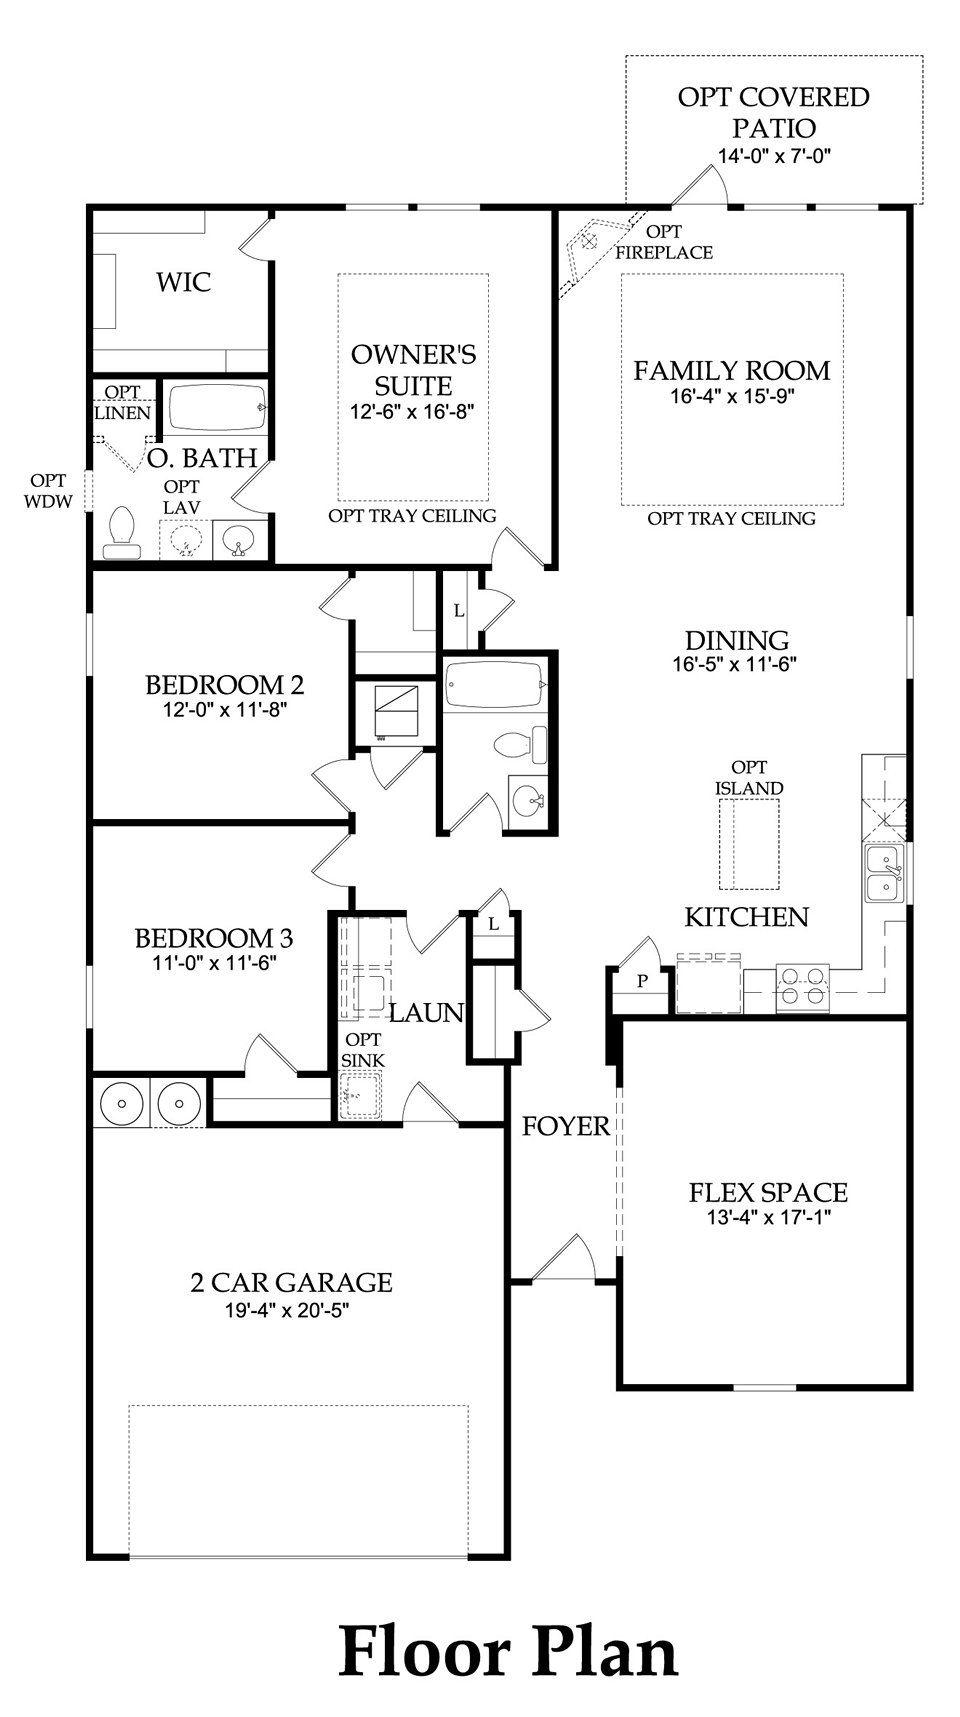 Stirling Bridge Austin Tx New Homes Centex Homes Compton Floor Plan 1951sq Ft 3 4 Bedrooms 2 3 Baths Floor Plans How To Plan Houses In Austin